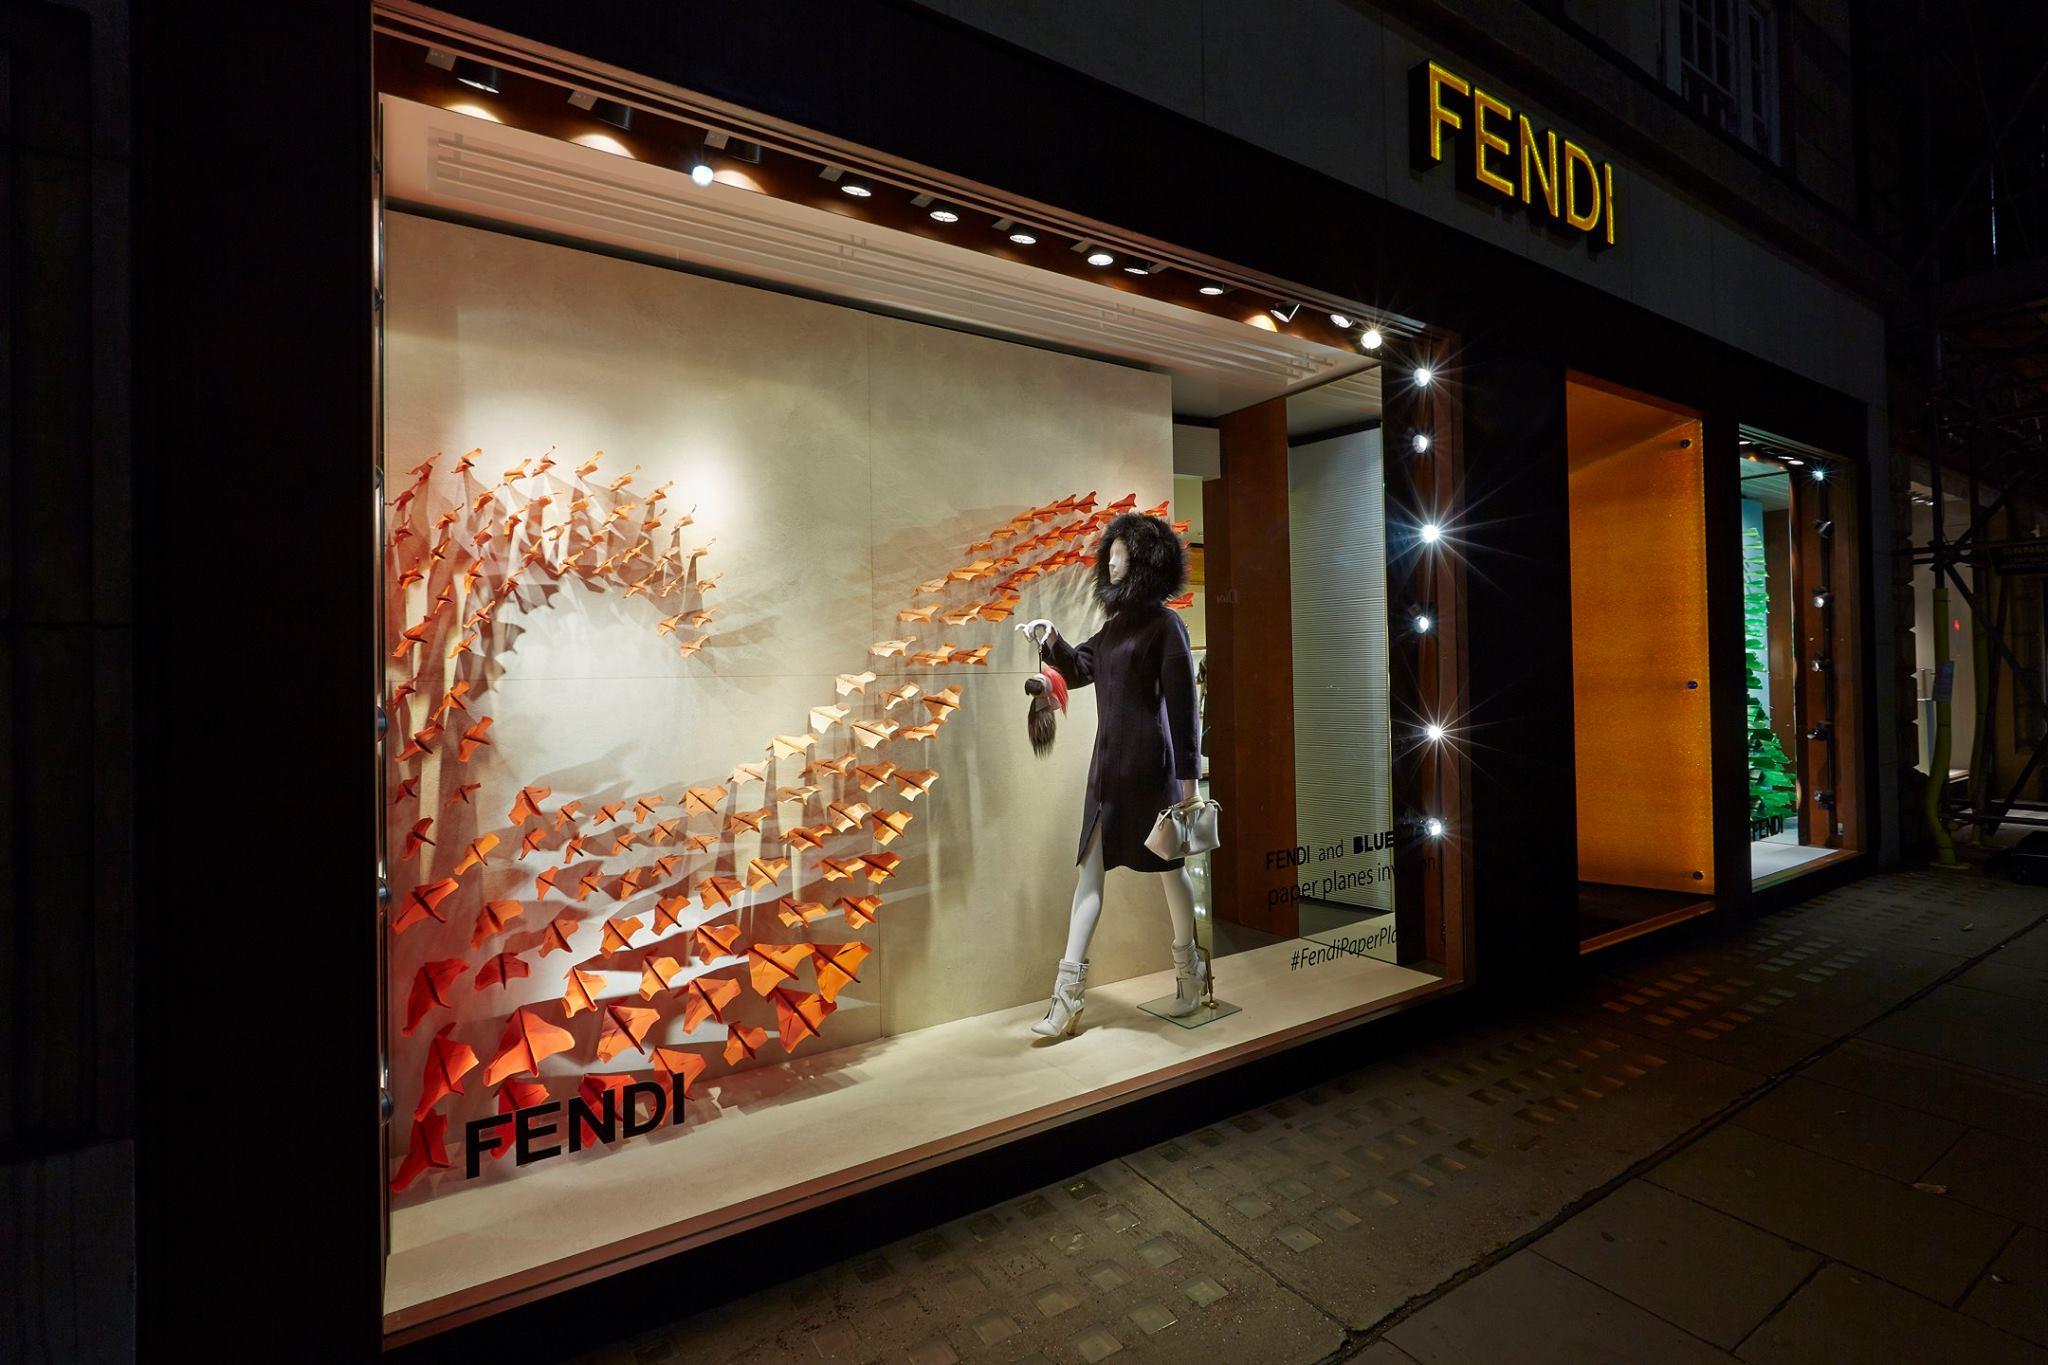 Colorful Paper Planes Invade Fendi Window Displays Worldwide